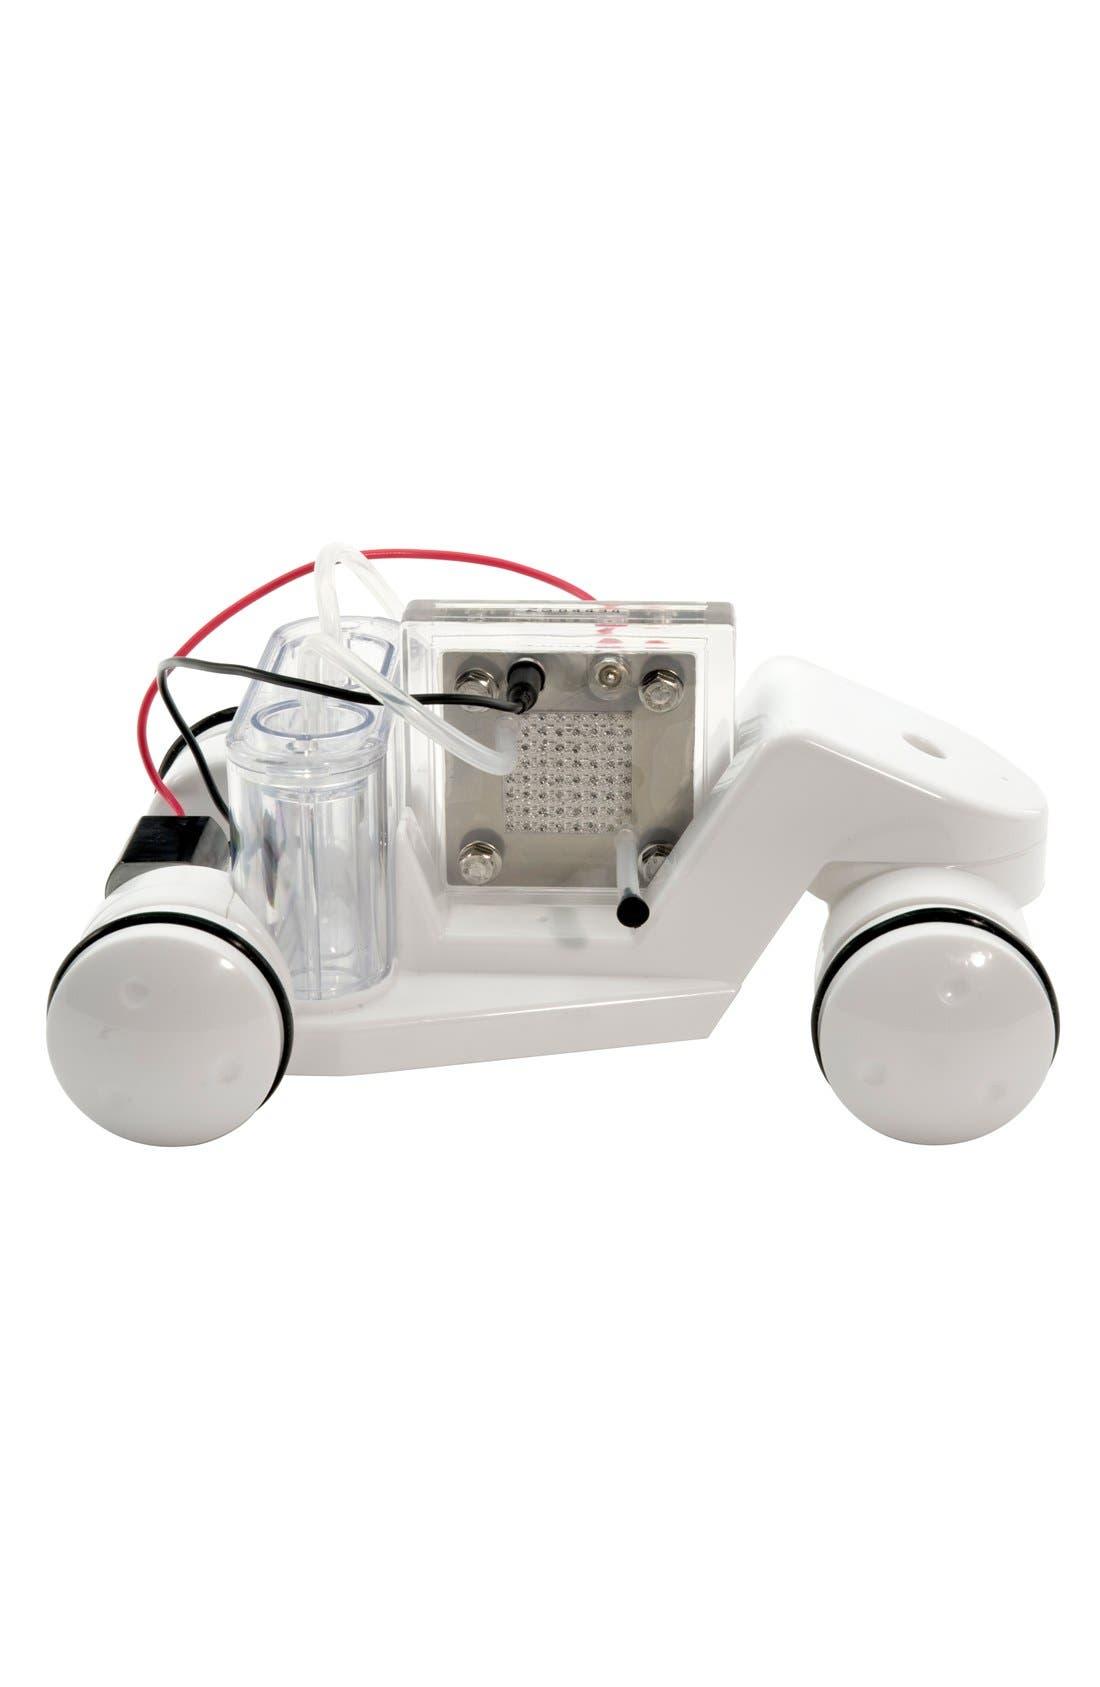 'Fuel Cell 10' Car Experiment Kit,                             Alternate thumbnail 6, color,                             No Color